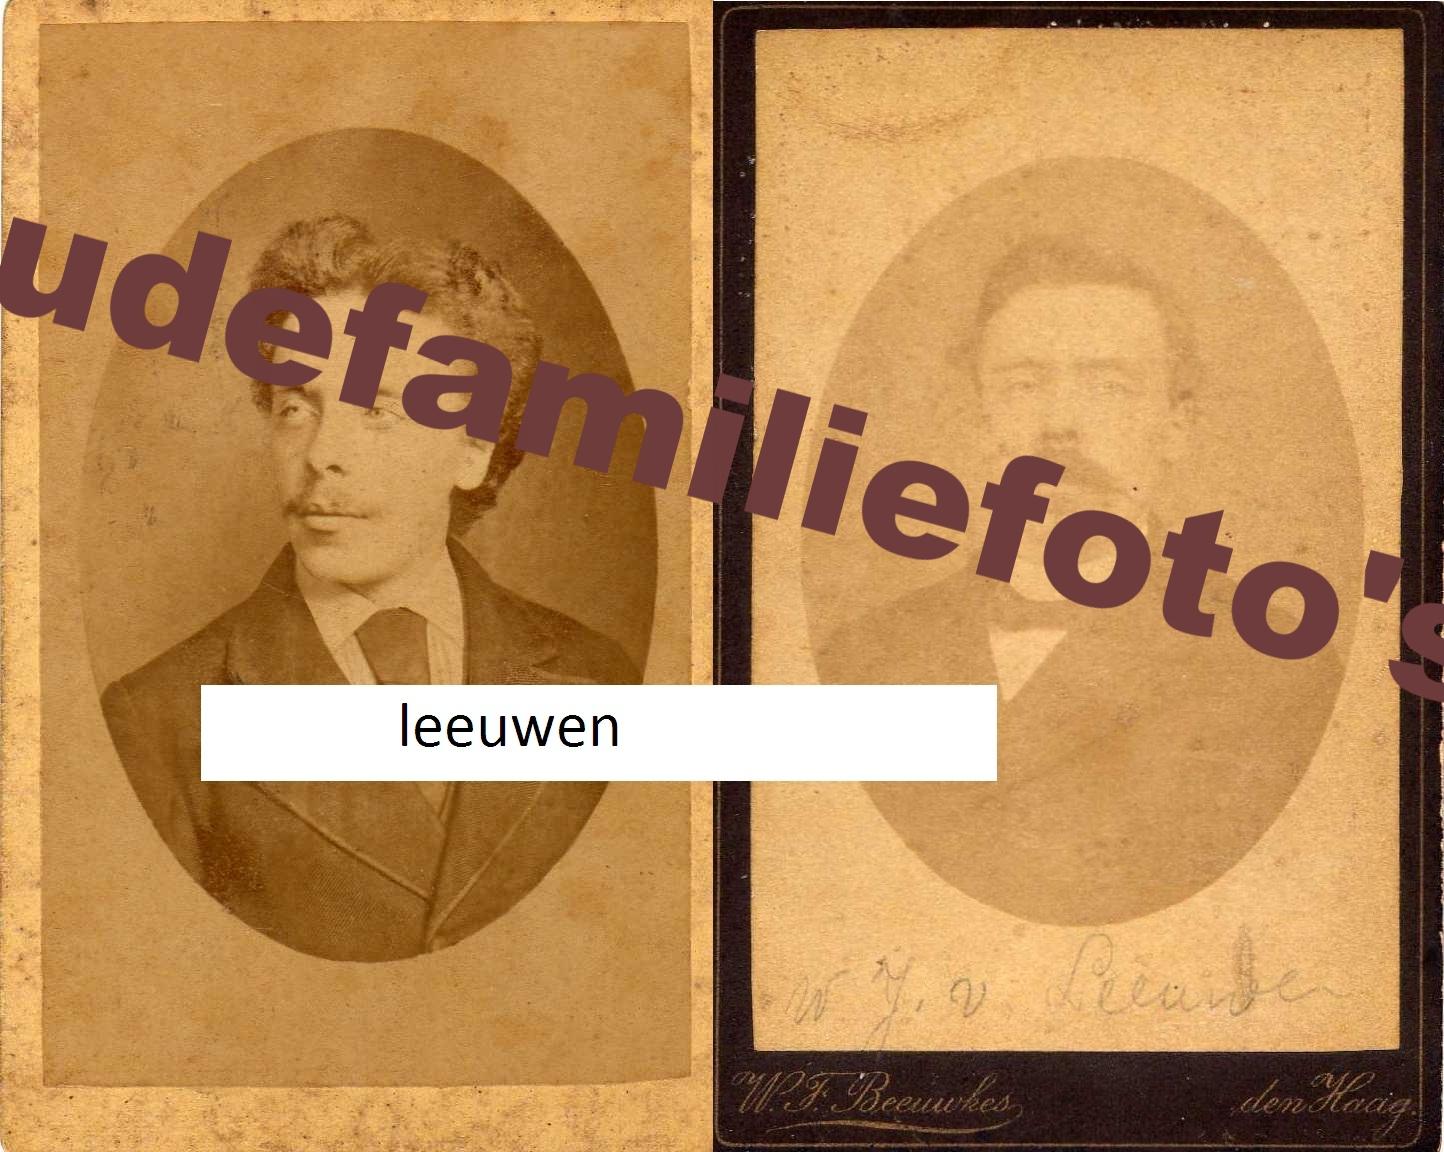 Leeuwen van, Wilhelmus Johannes. geb. 4-2-1860 Den-Haag. Zoon van Wilhelmus en Anna Maria v/d Zande. € Prijs in overleg.